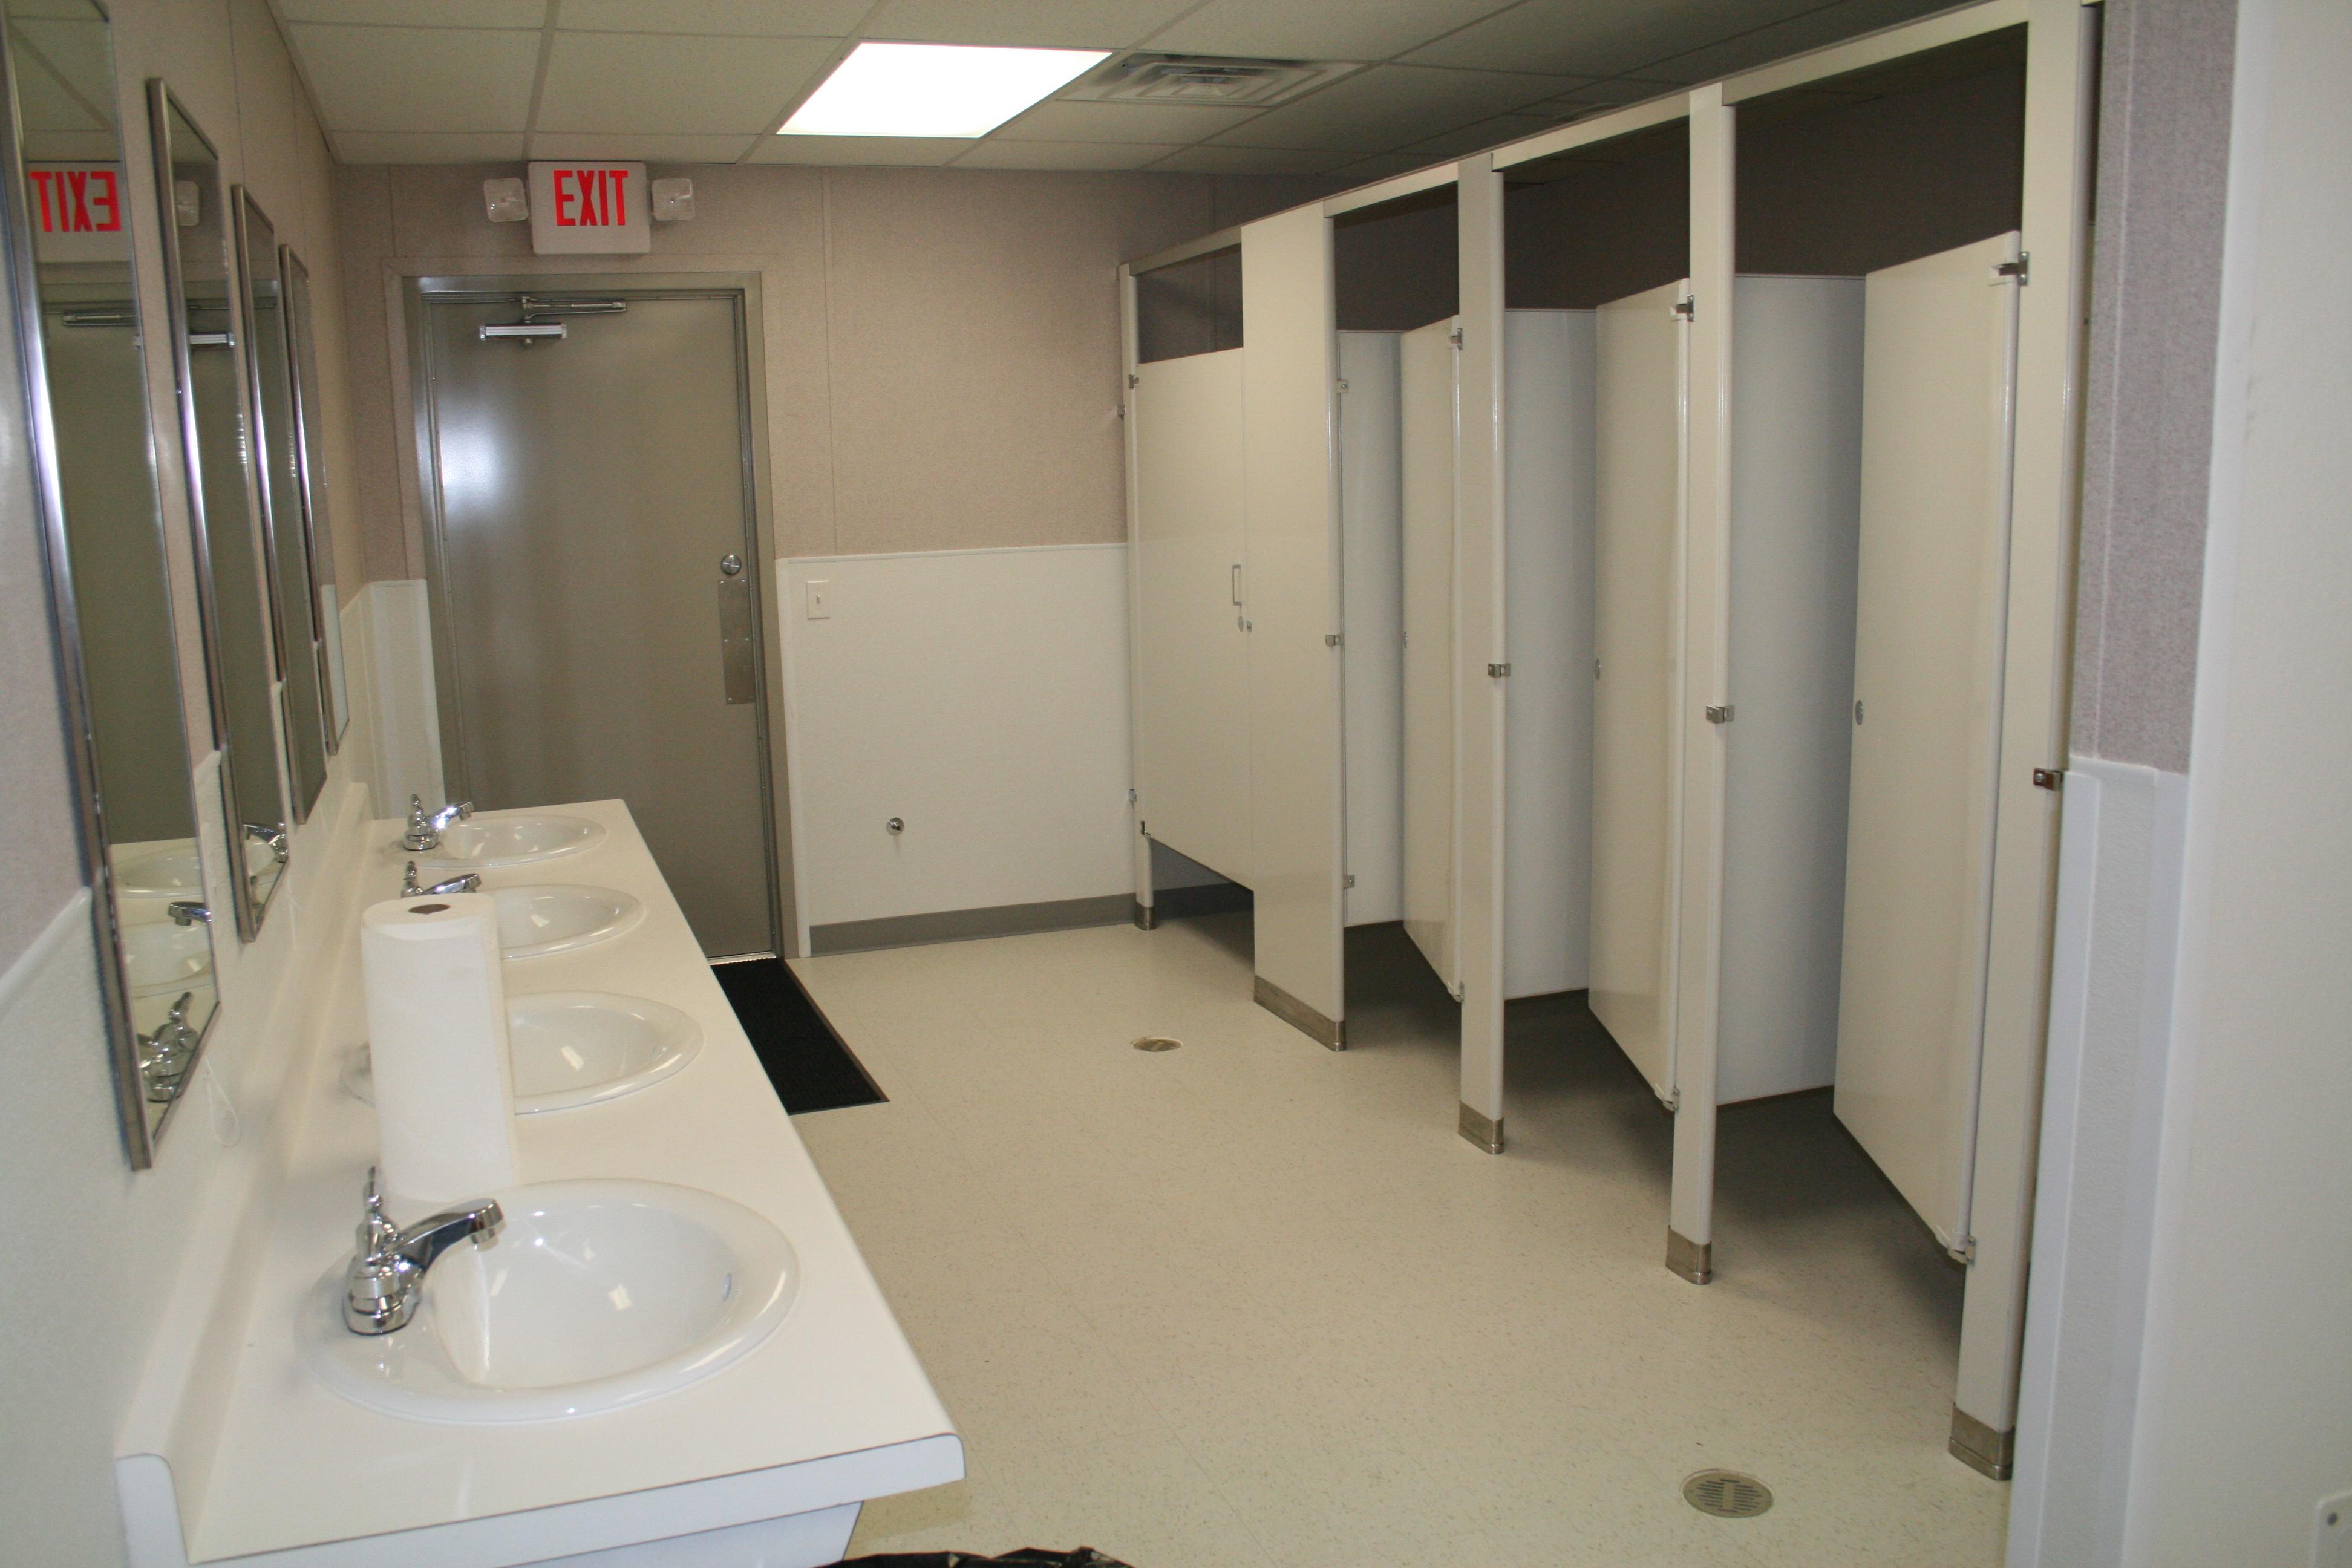 Plenty of toilets and sinks